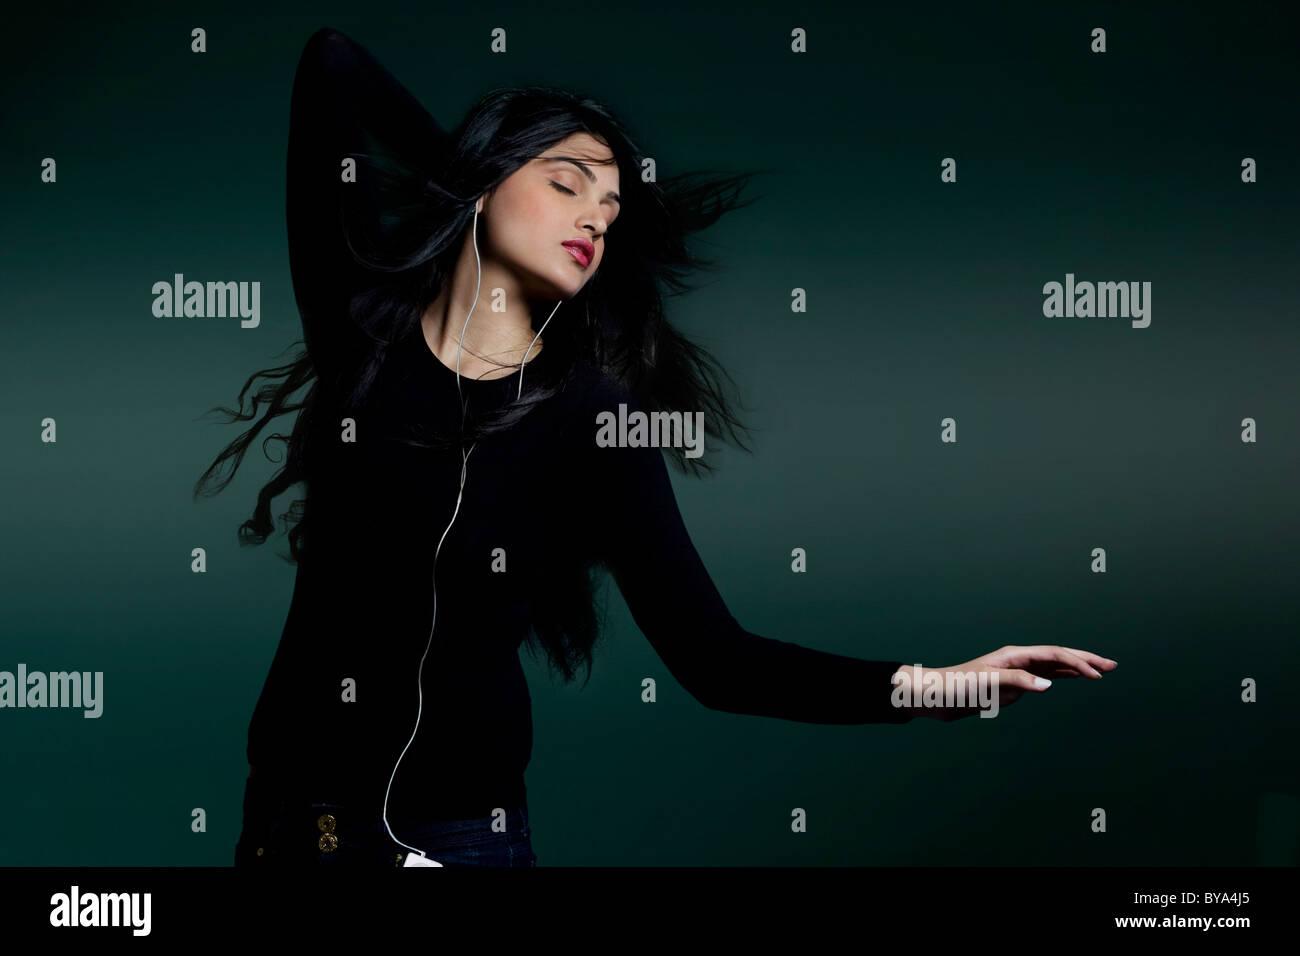 Mädchen Musik hören Stockbild